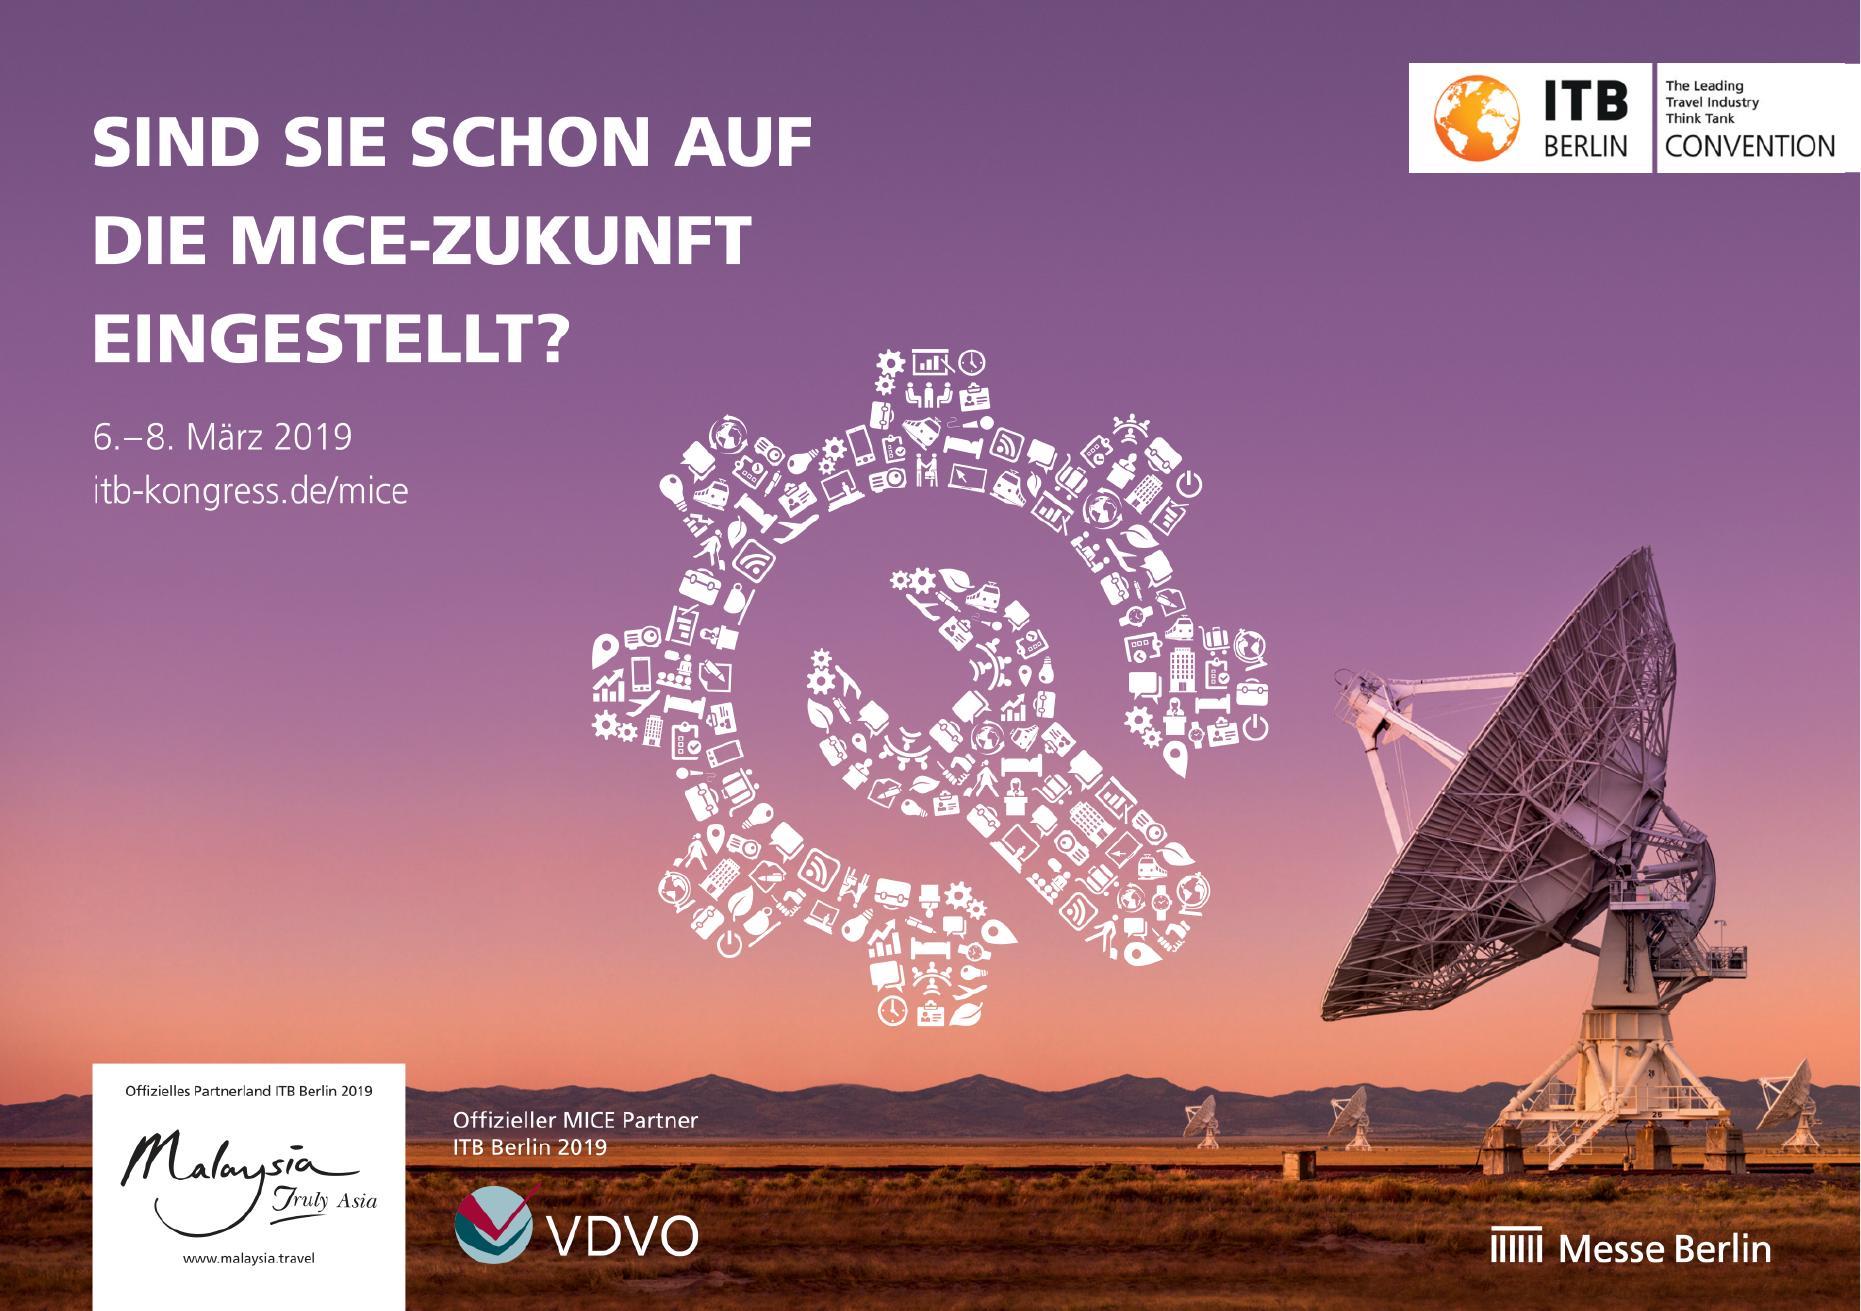 ITB Berlin Kongress